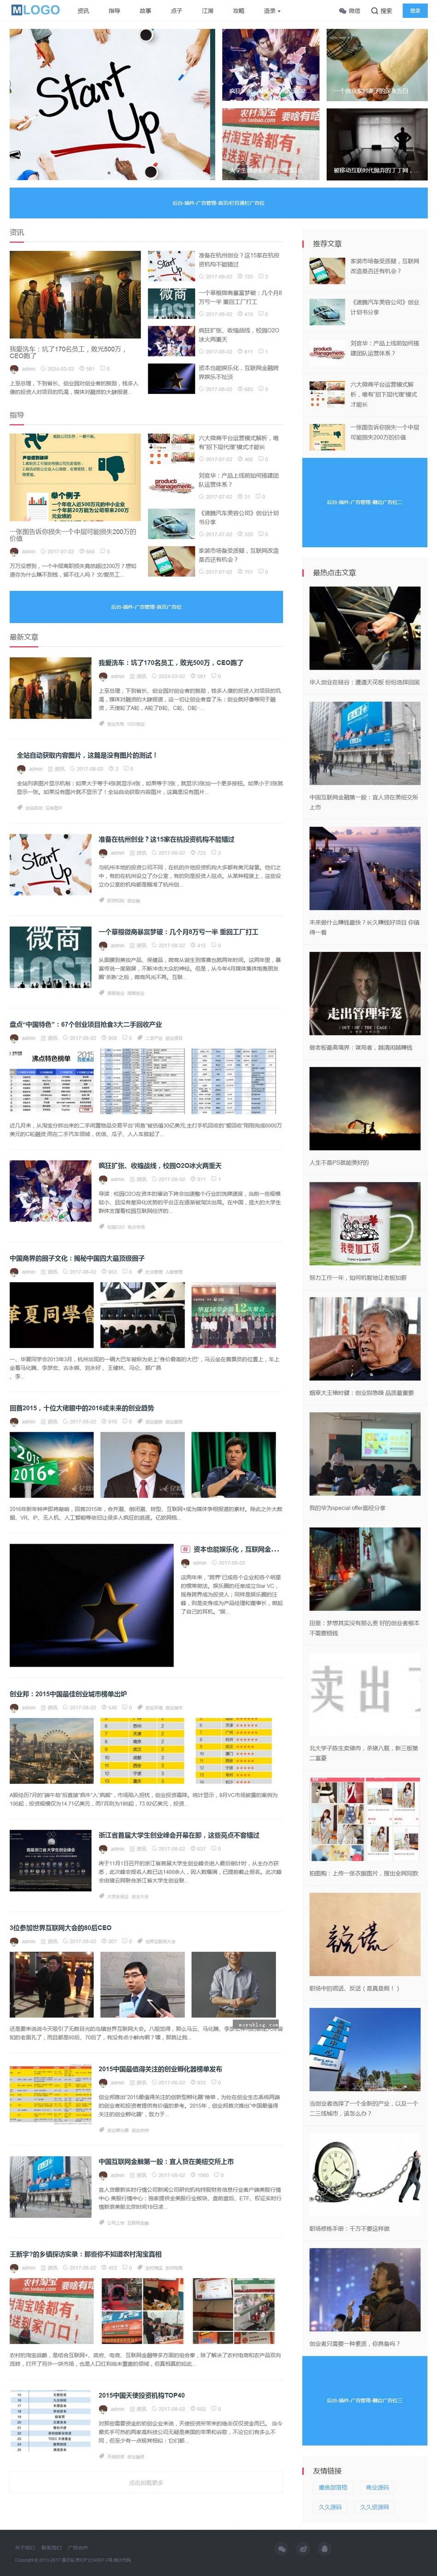 HTML5自适应响应式博客文章资讯新闻站群帝国CMS网站模板整站手机